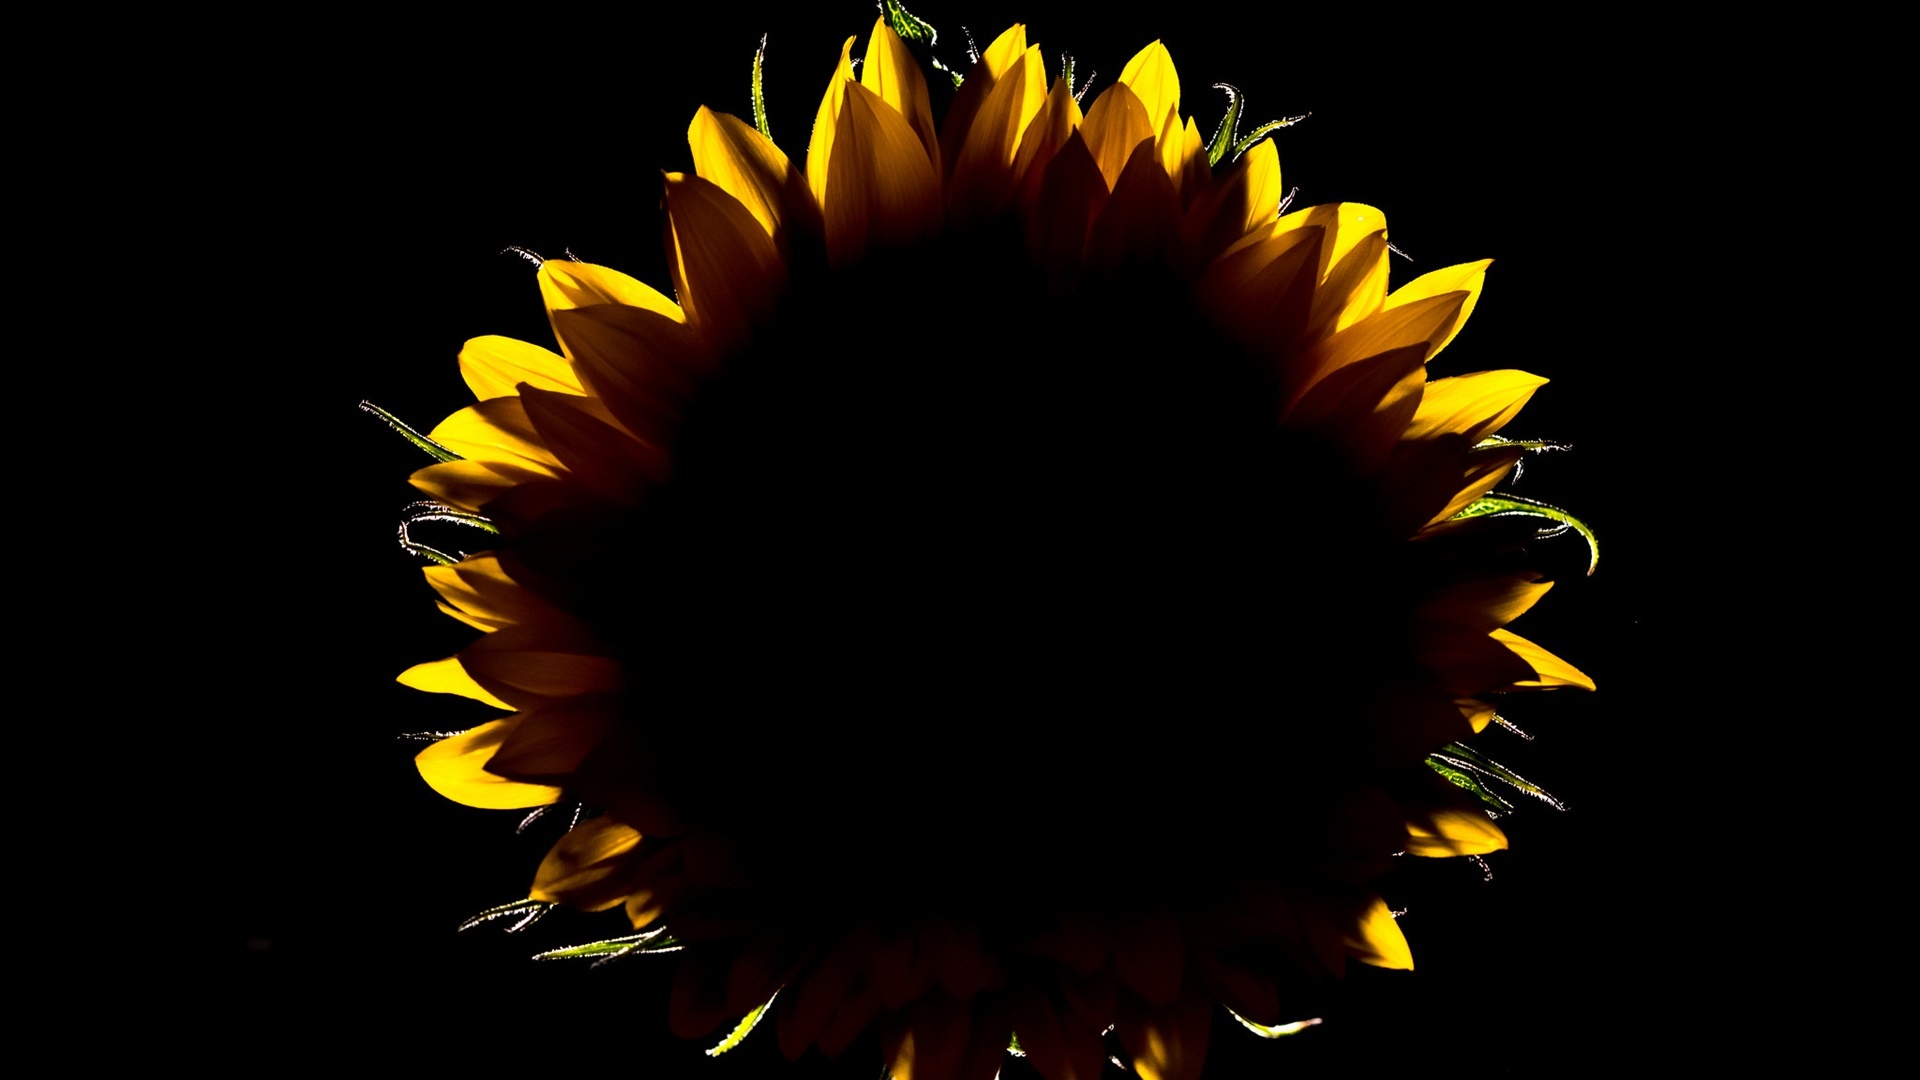 Sunflower free wallpaper